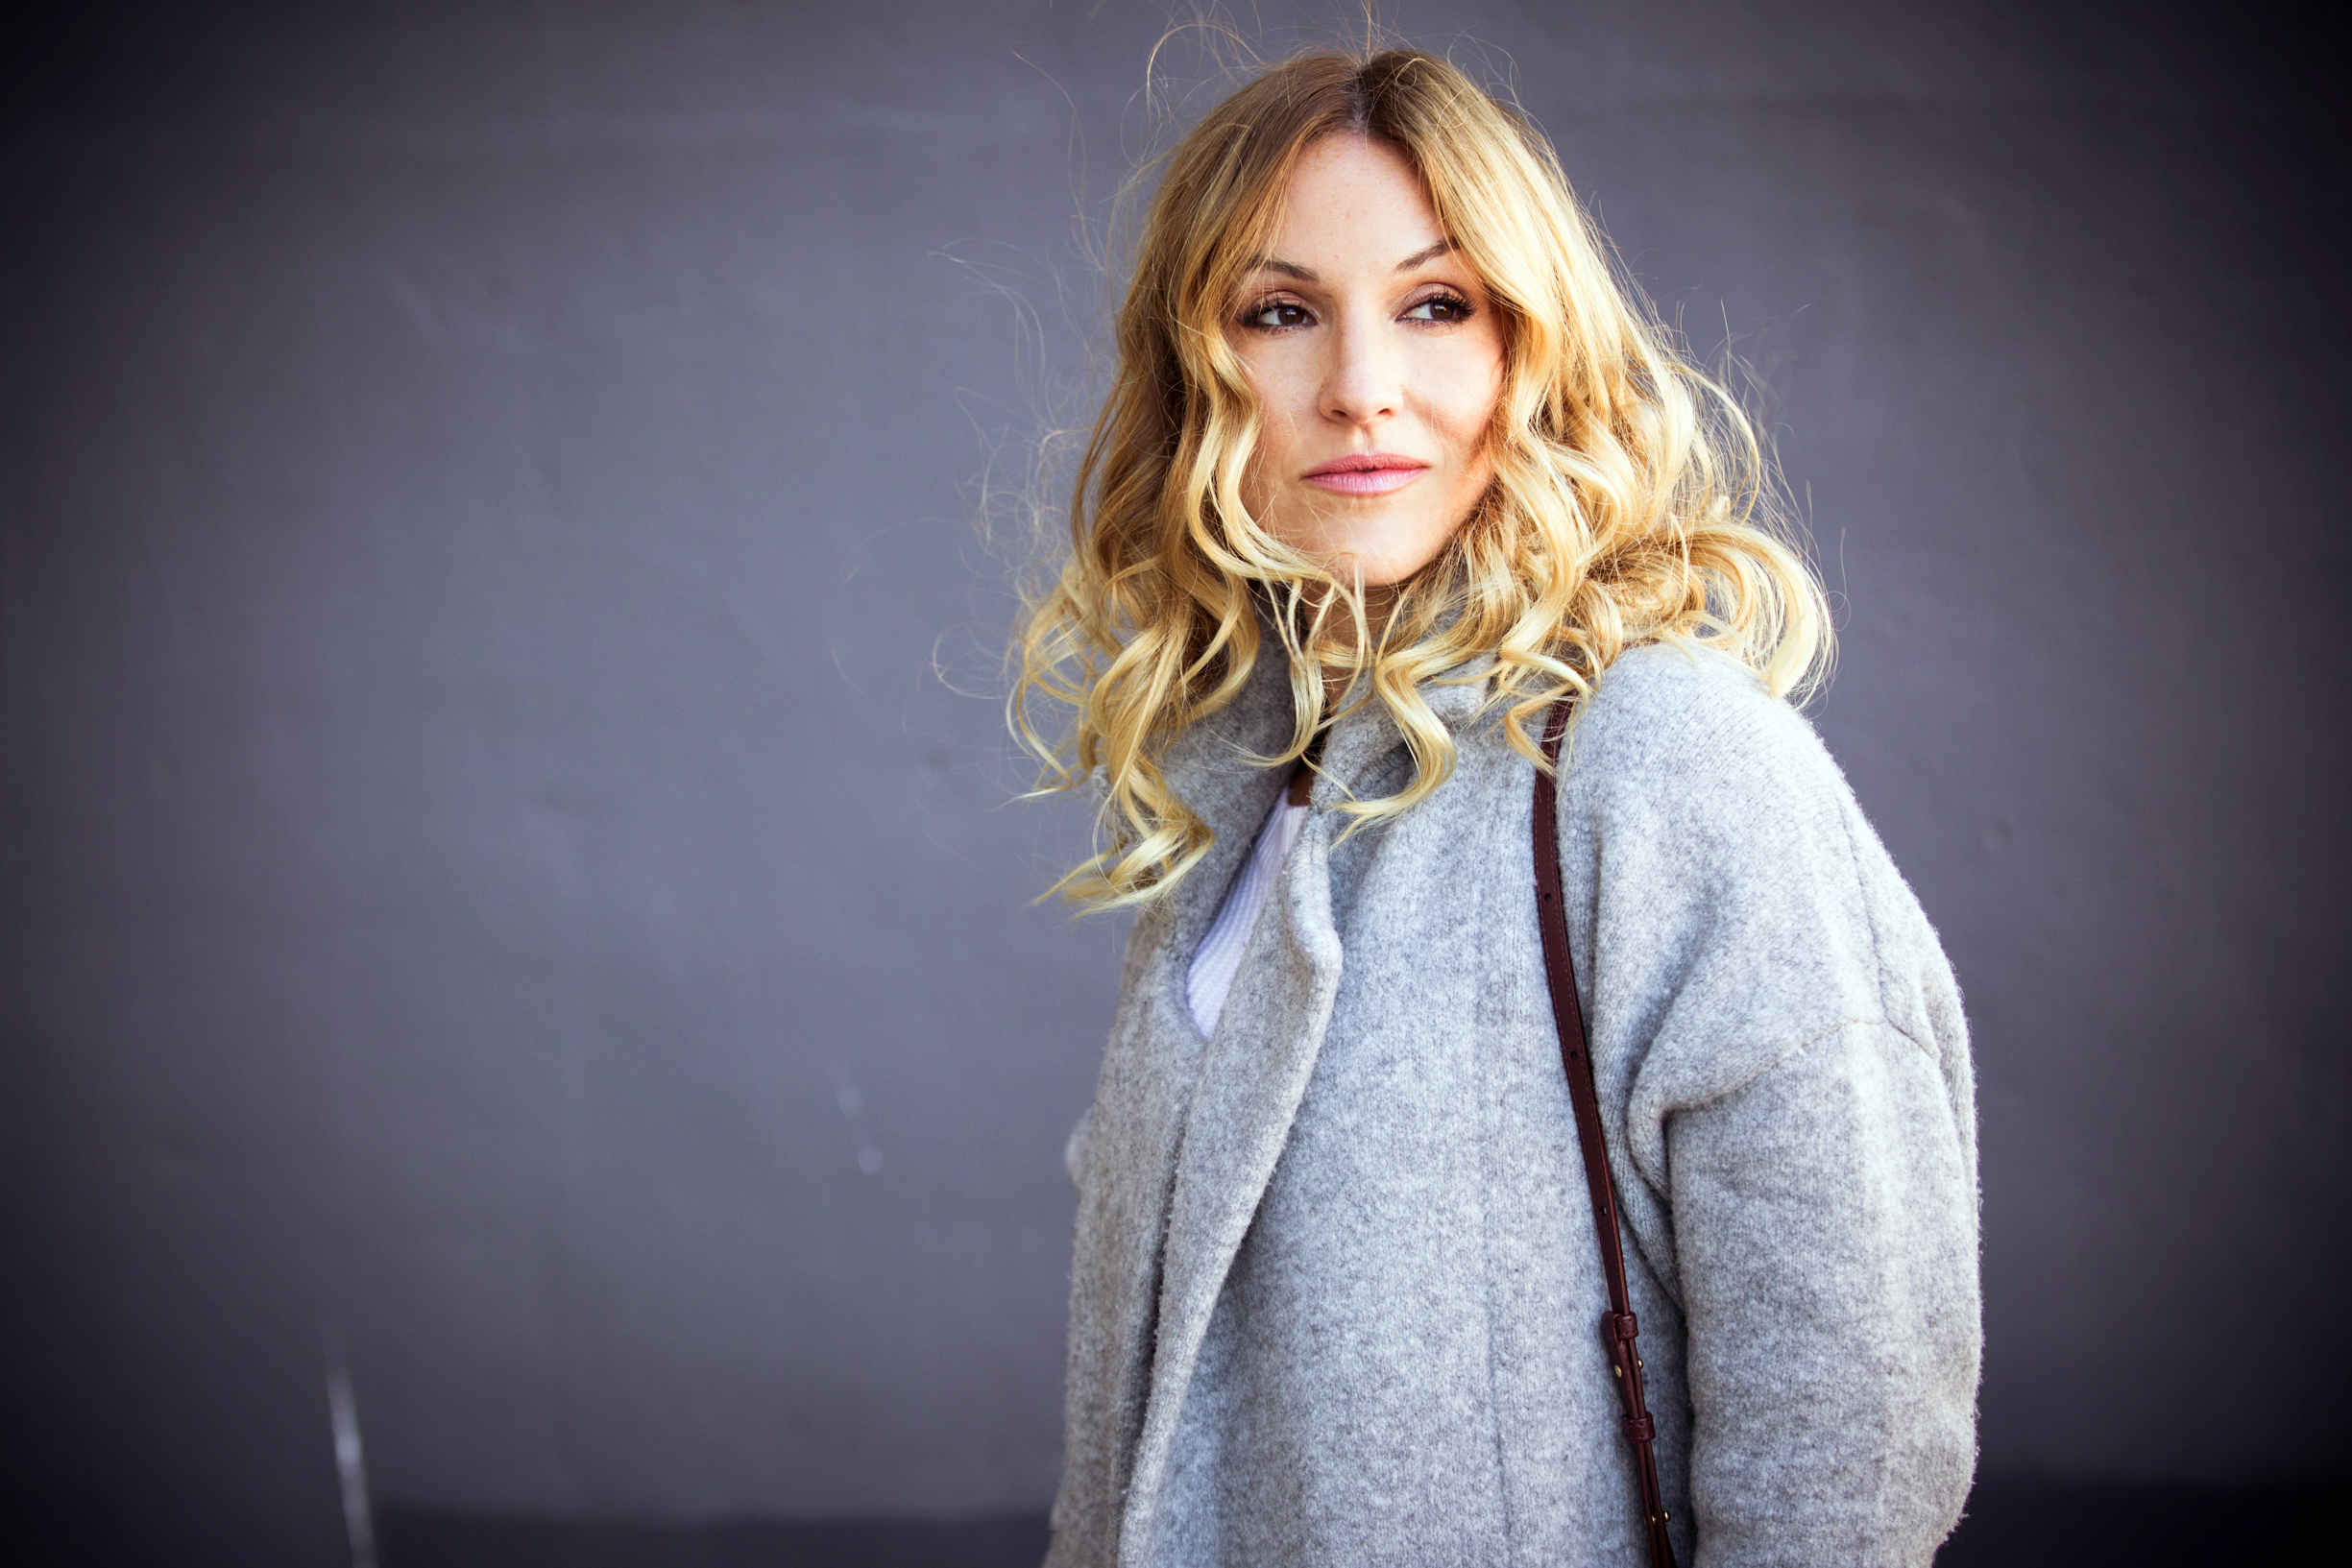 mademoiselle jules fashion blogger montreal canada mlle jules soyer LA coat